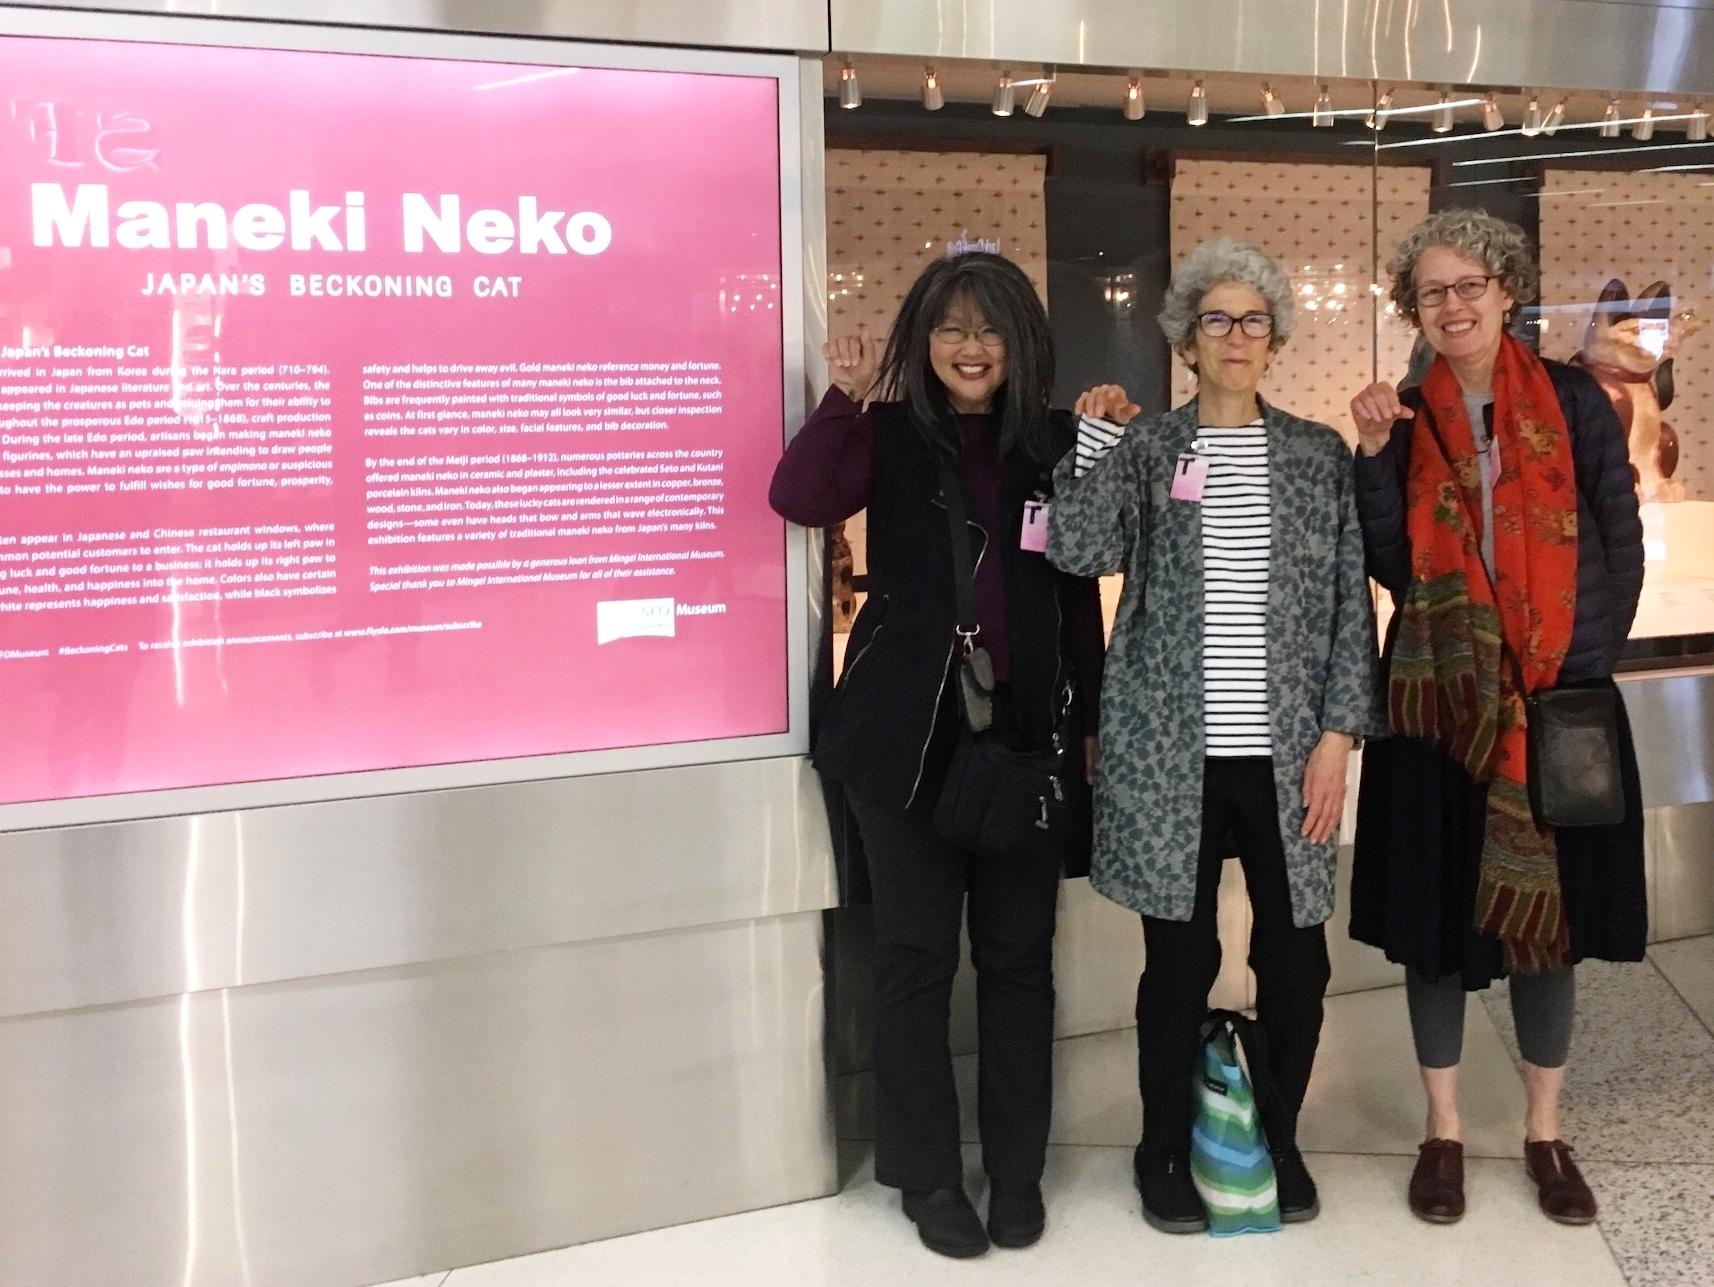 Maneki Neko  exhibition at SFO Airport Museum. Pictured: C.K.Itamura, Alyson Kuhn and Linda Smith. Photo by Belinda Li.